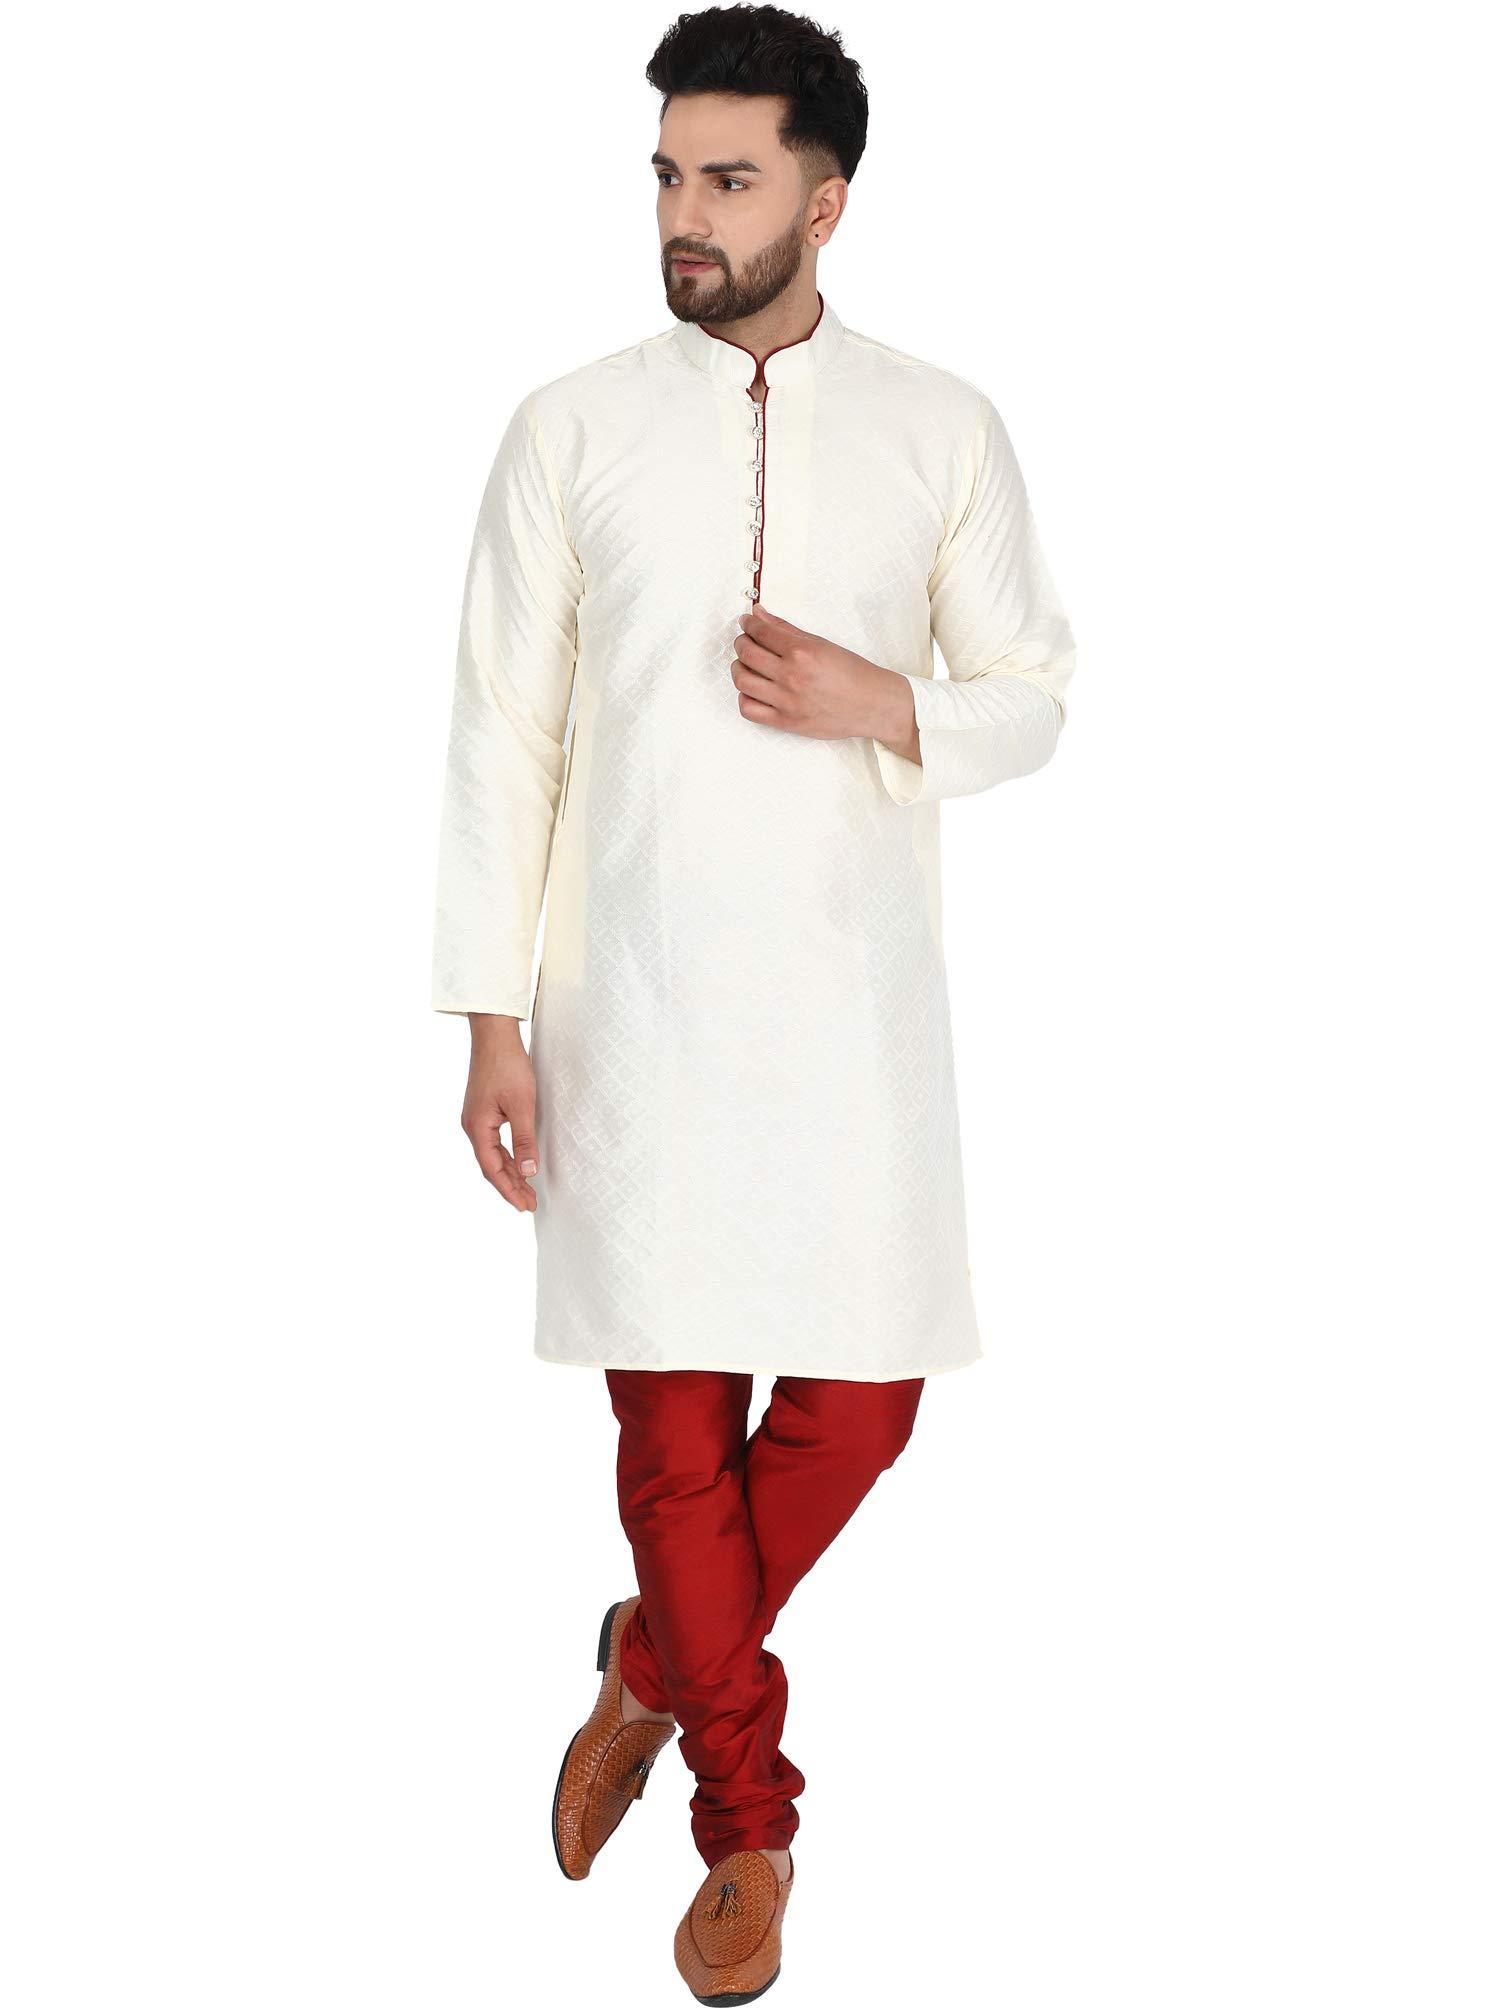 SKAVIJ Men's Indian Art Silk Summer Kurta Pajama Wedding Party Festivals Dress Set